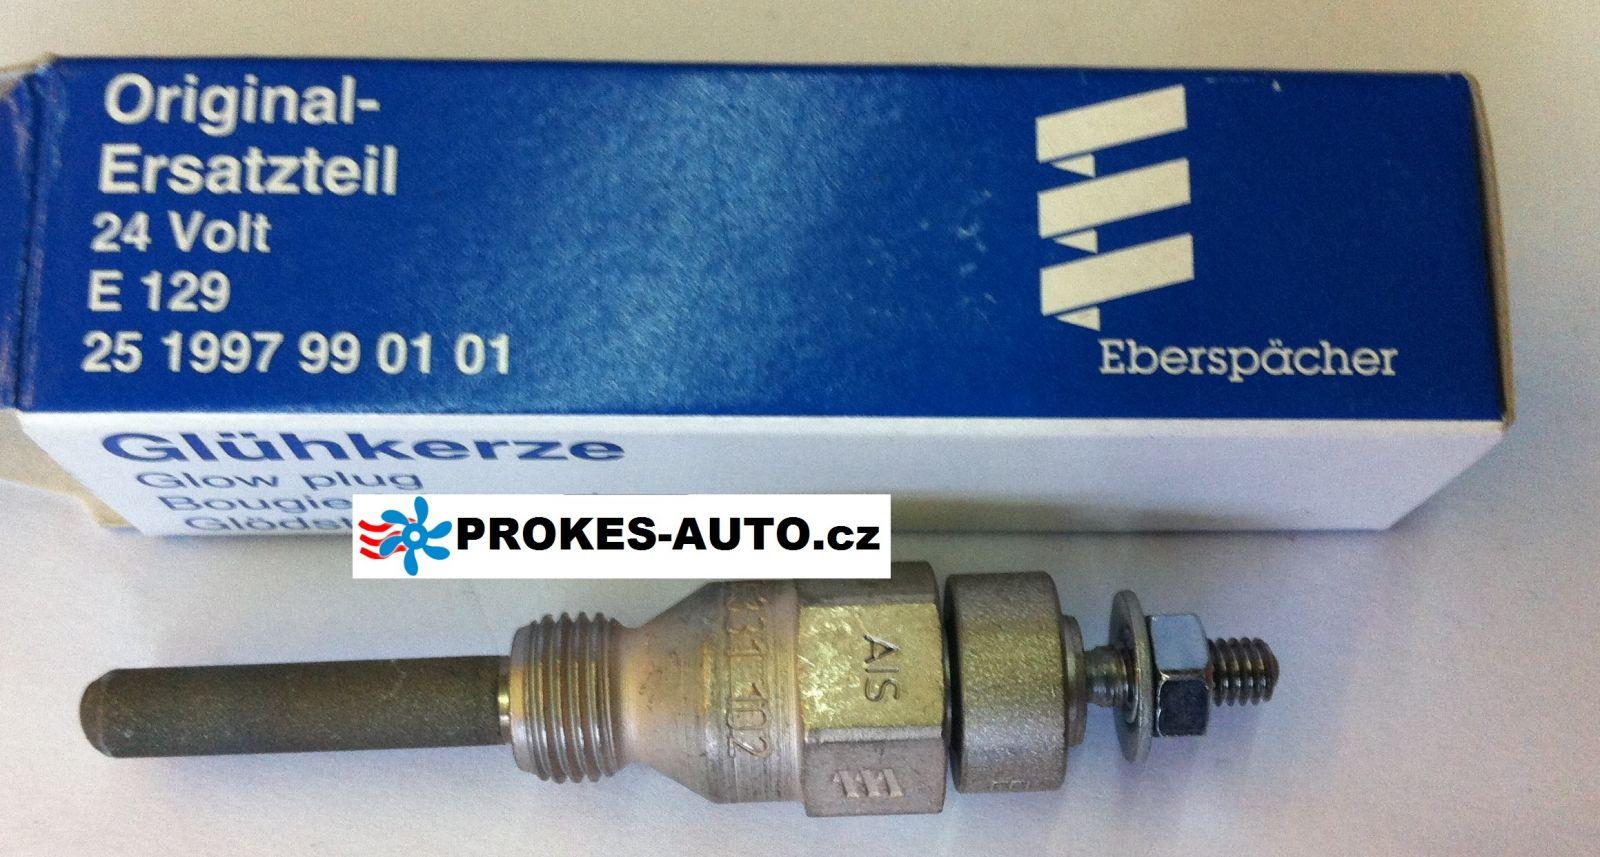 Žhaviaci sviečka E129 24V Hydronic 10 / D9W 251997990101 Eberspächer